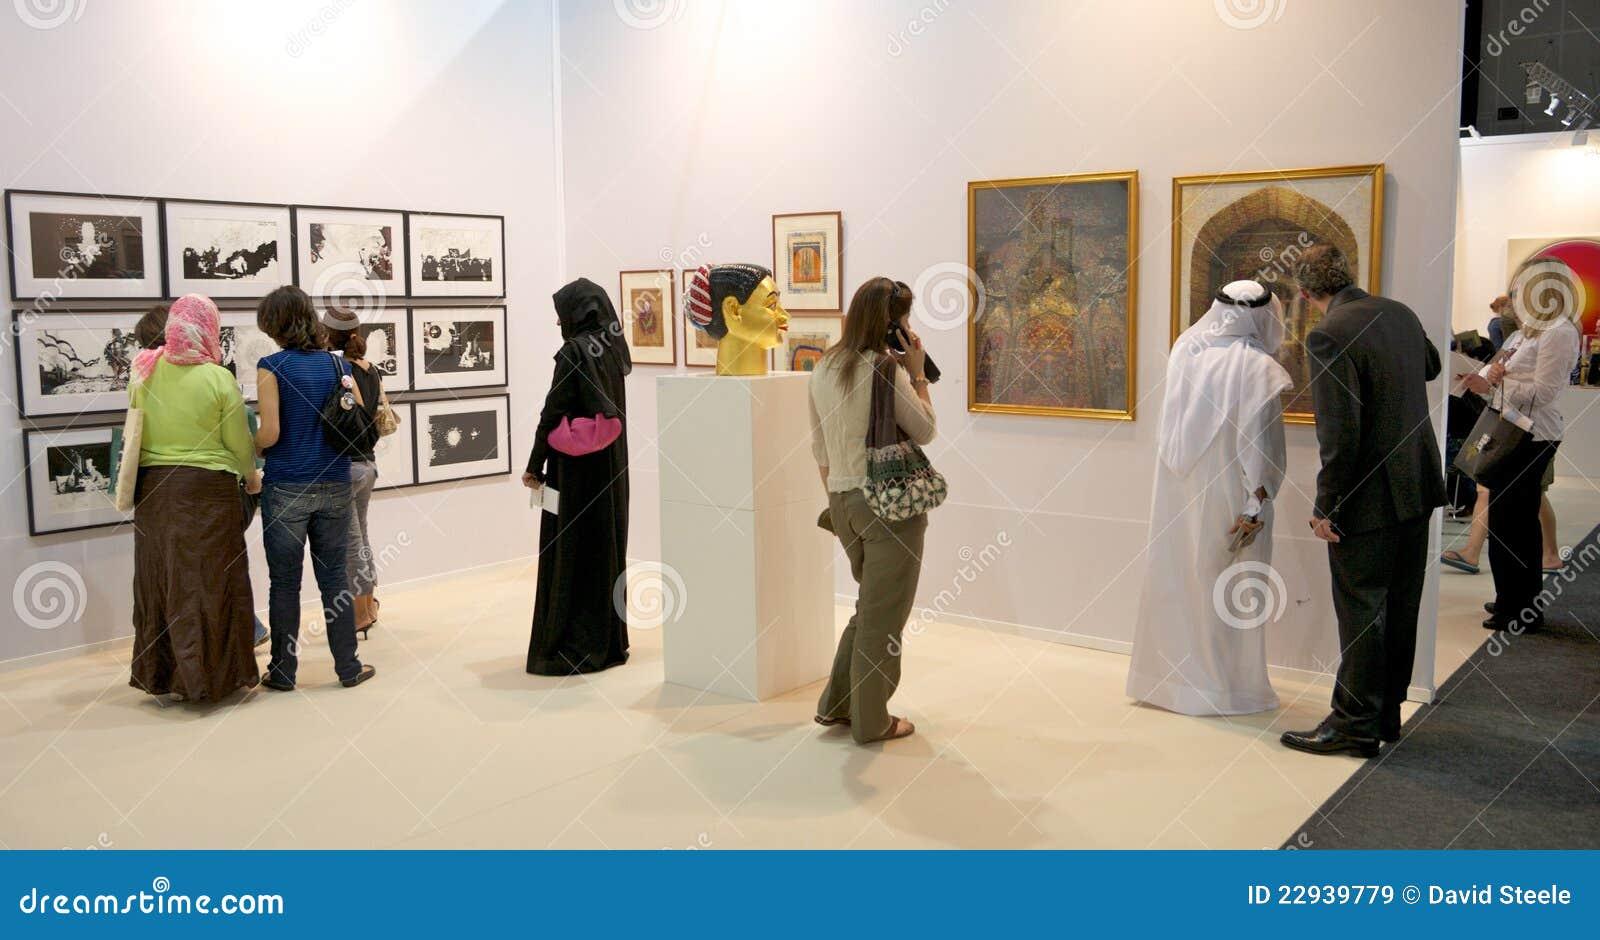 D Art Exhibition In Dubai : Art dubai editorial stock image image of exhibition